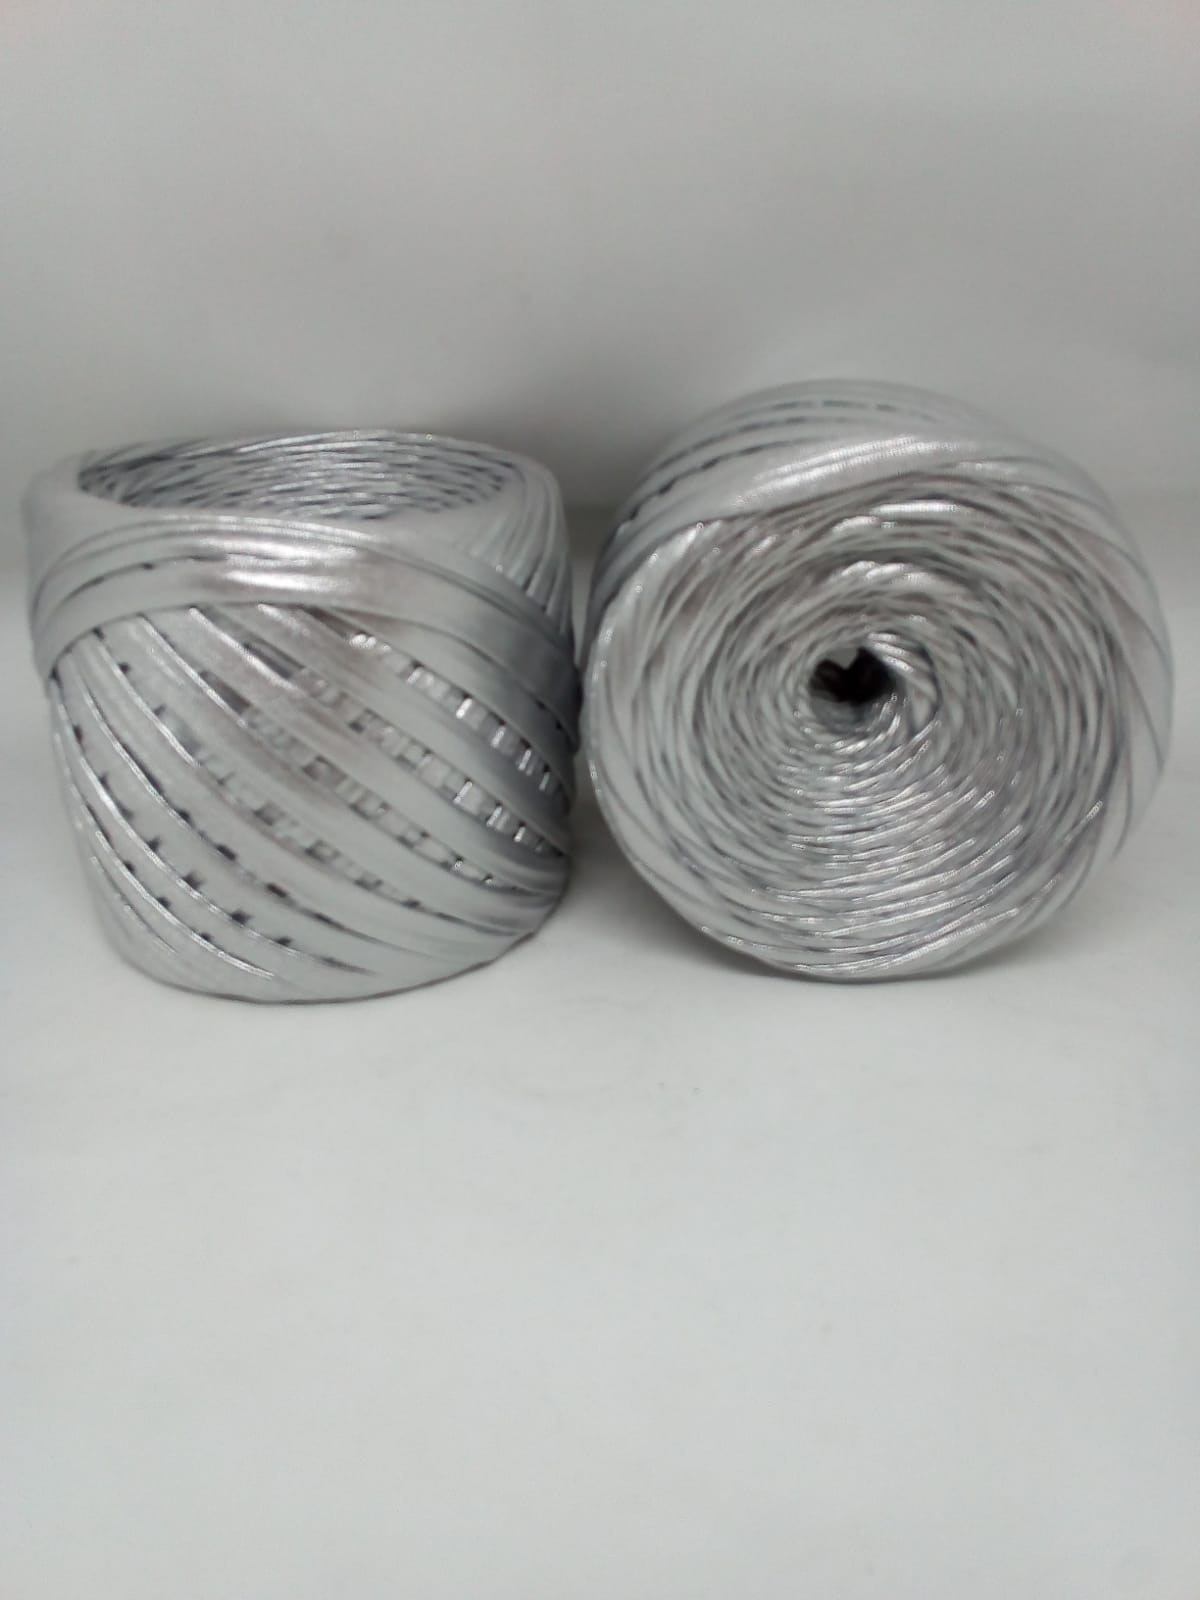 Maccaroni Metallic (Маккарони металика) 2 - серебро купить в Беларуси